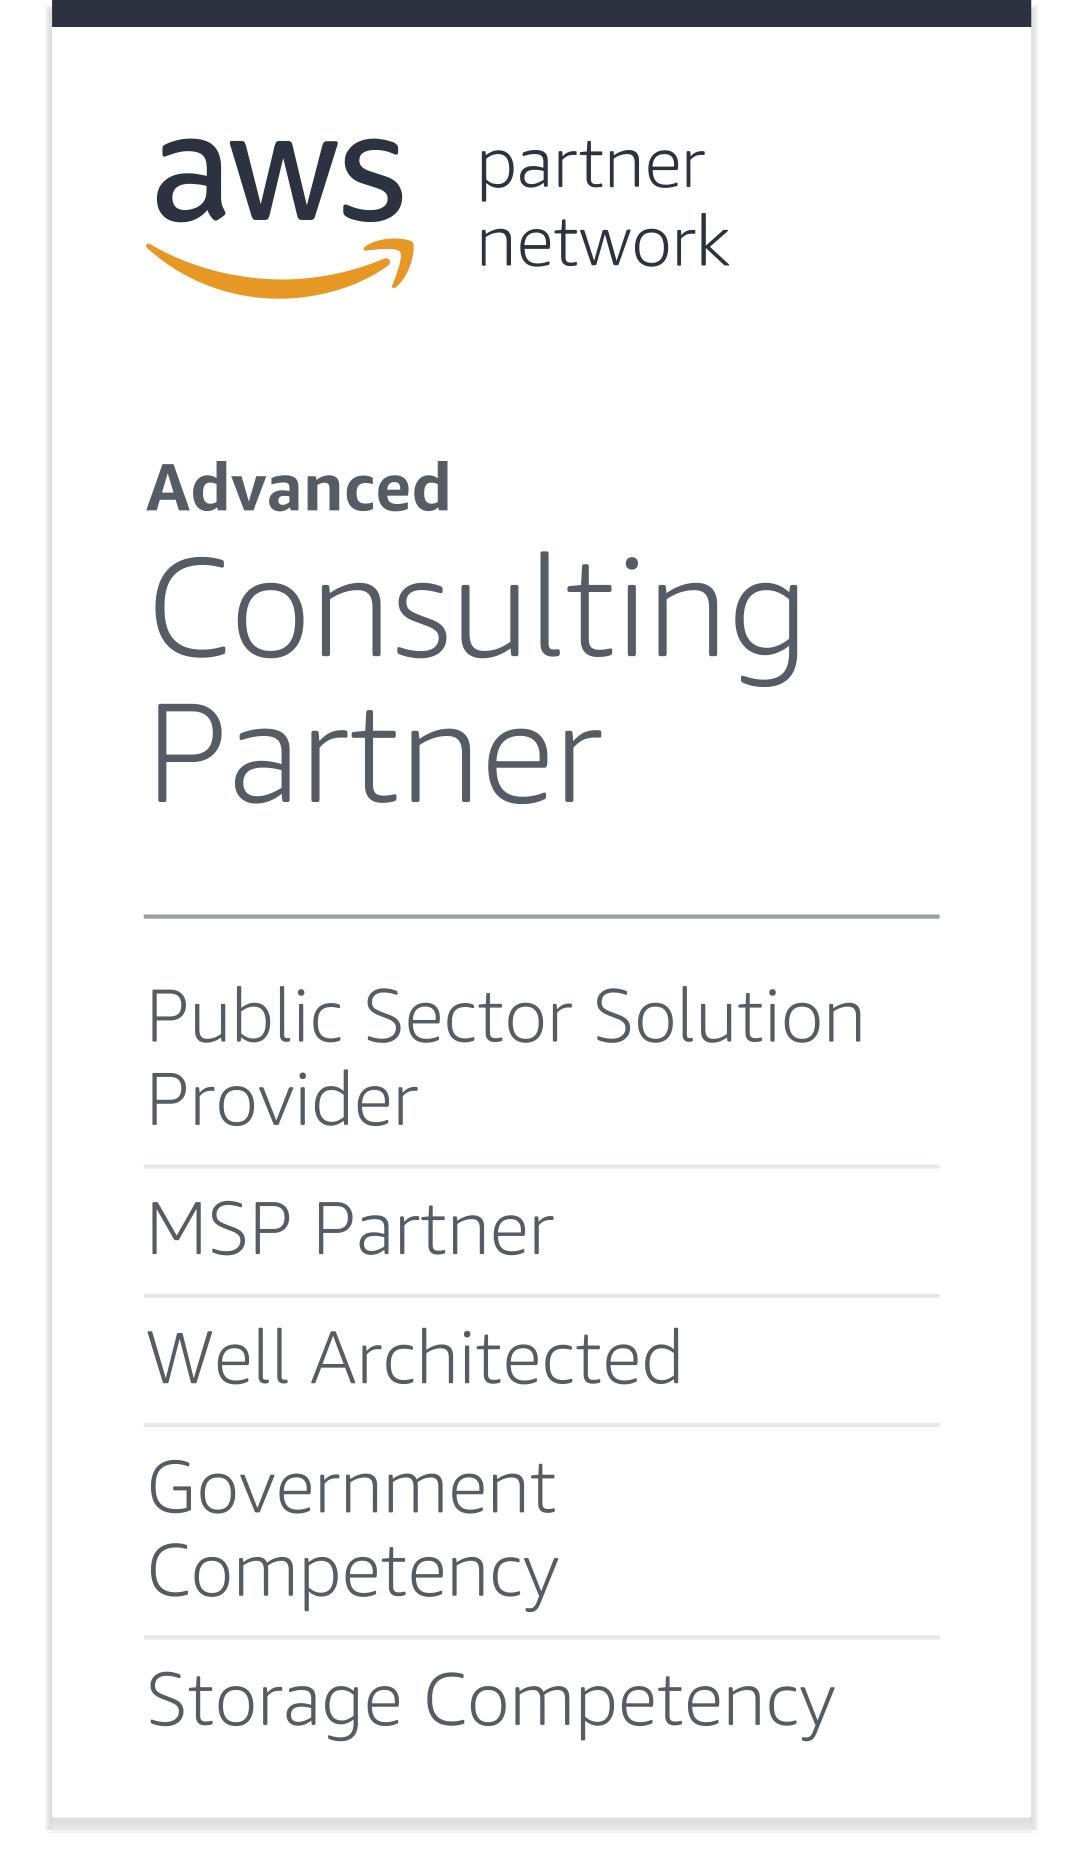 AWS Advanced Consulting Partner Logo - Gray sans-serif type